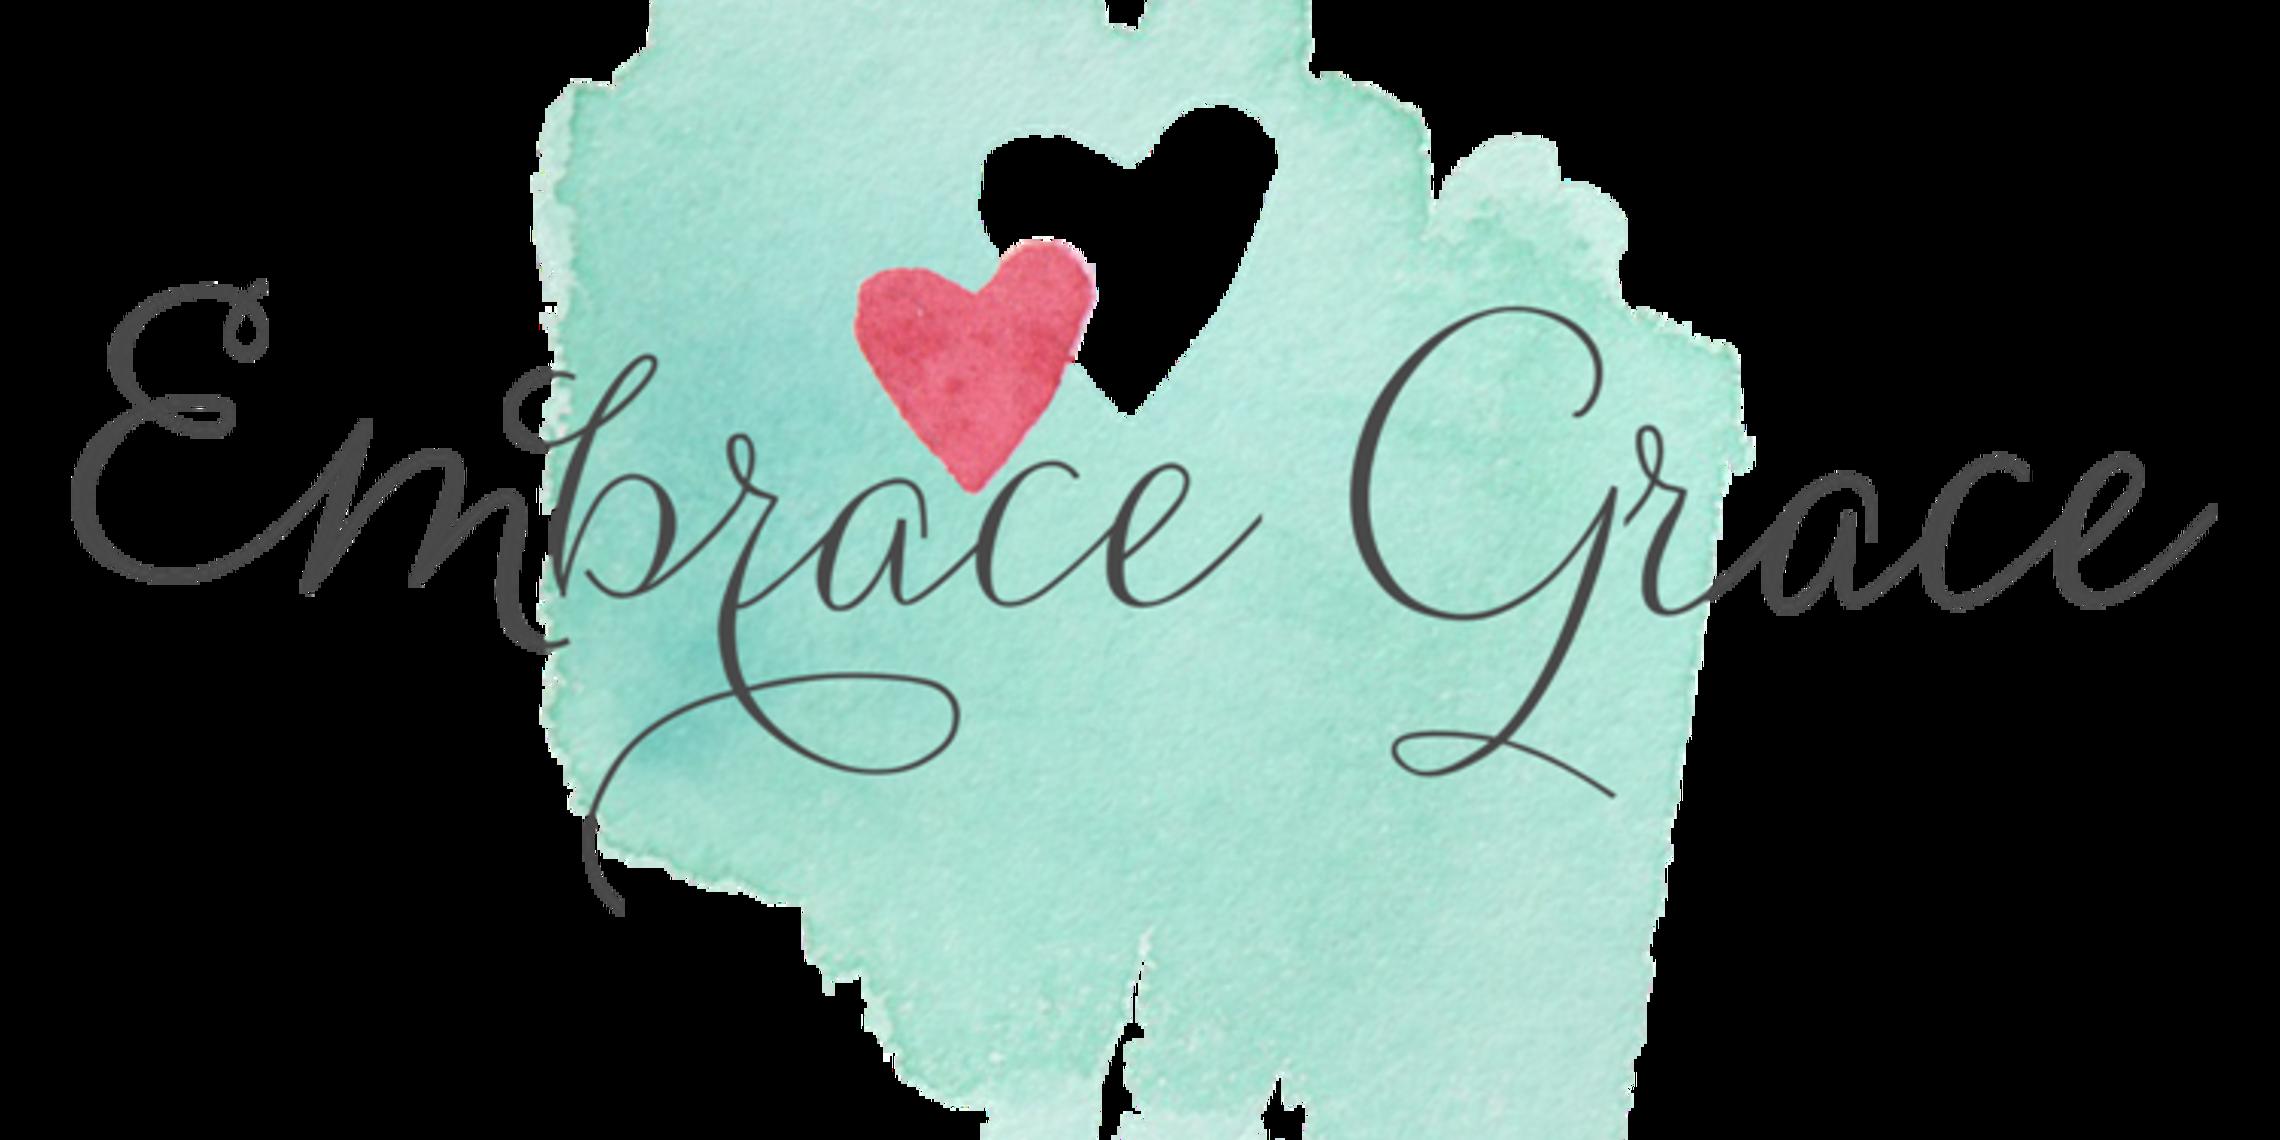 Smaller Embrace Grace Logo